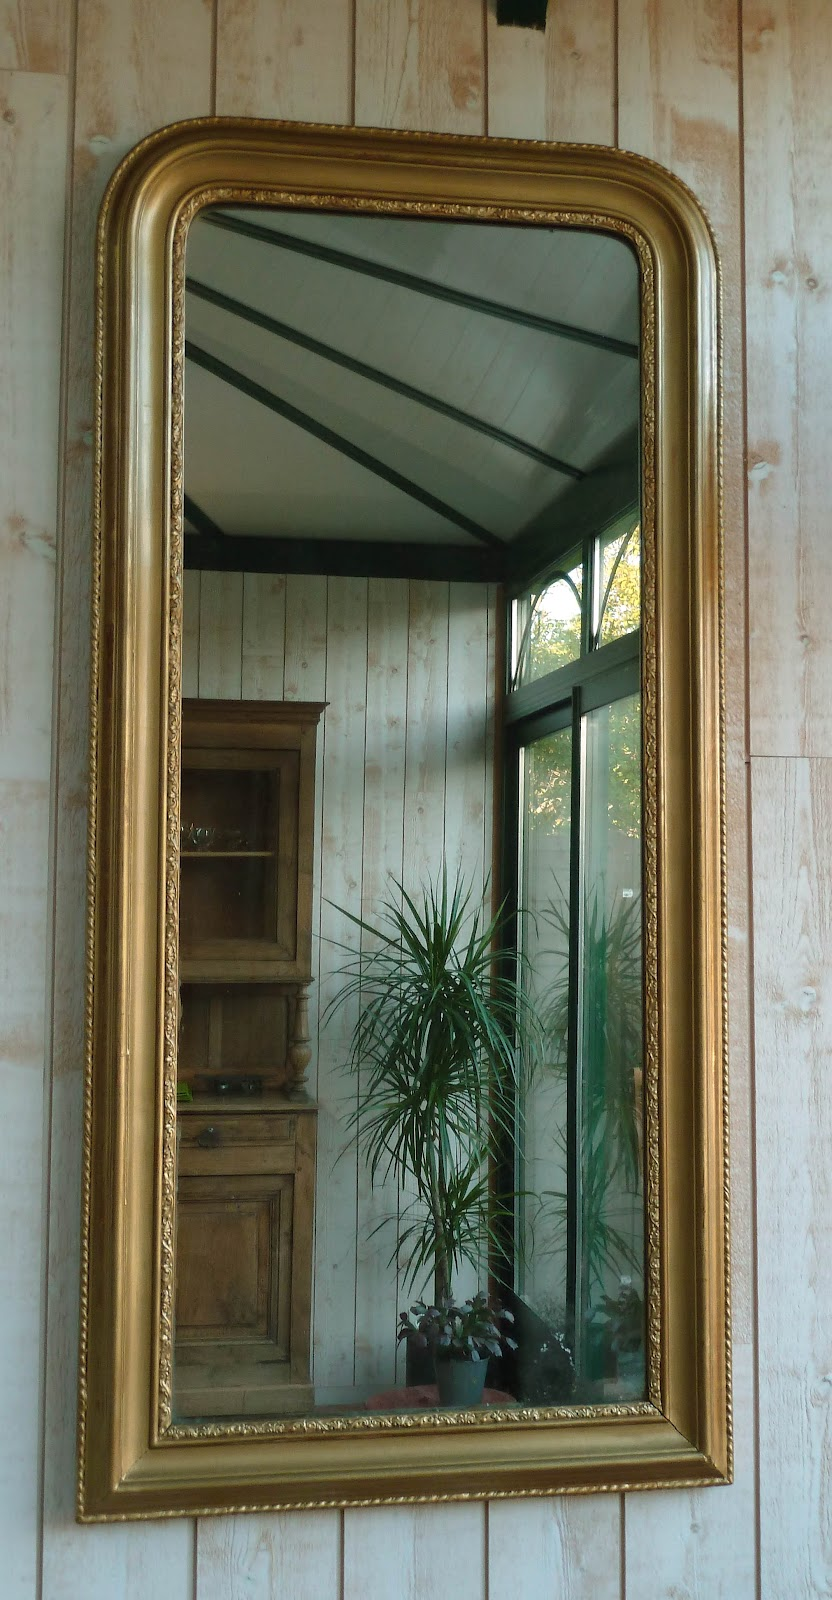 L 39 atelier d 39 emmanuelle miroir mon beau miroir for Desire miroir miroir